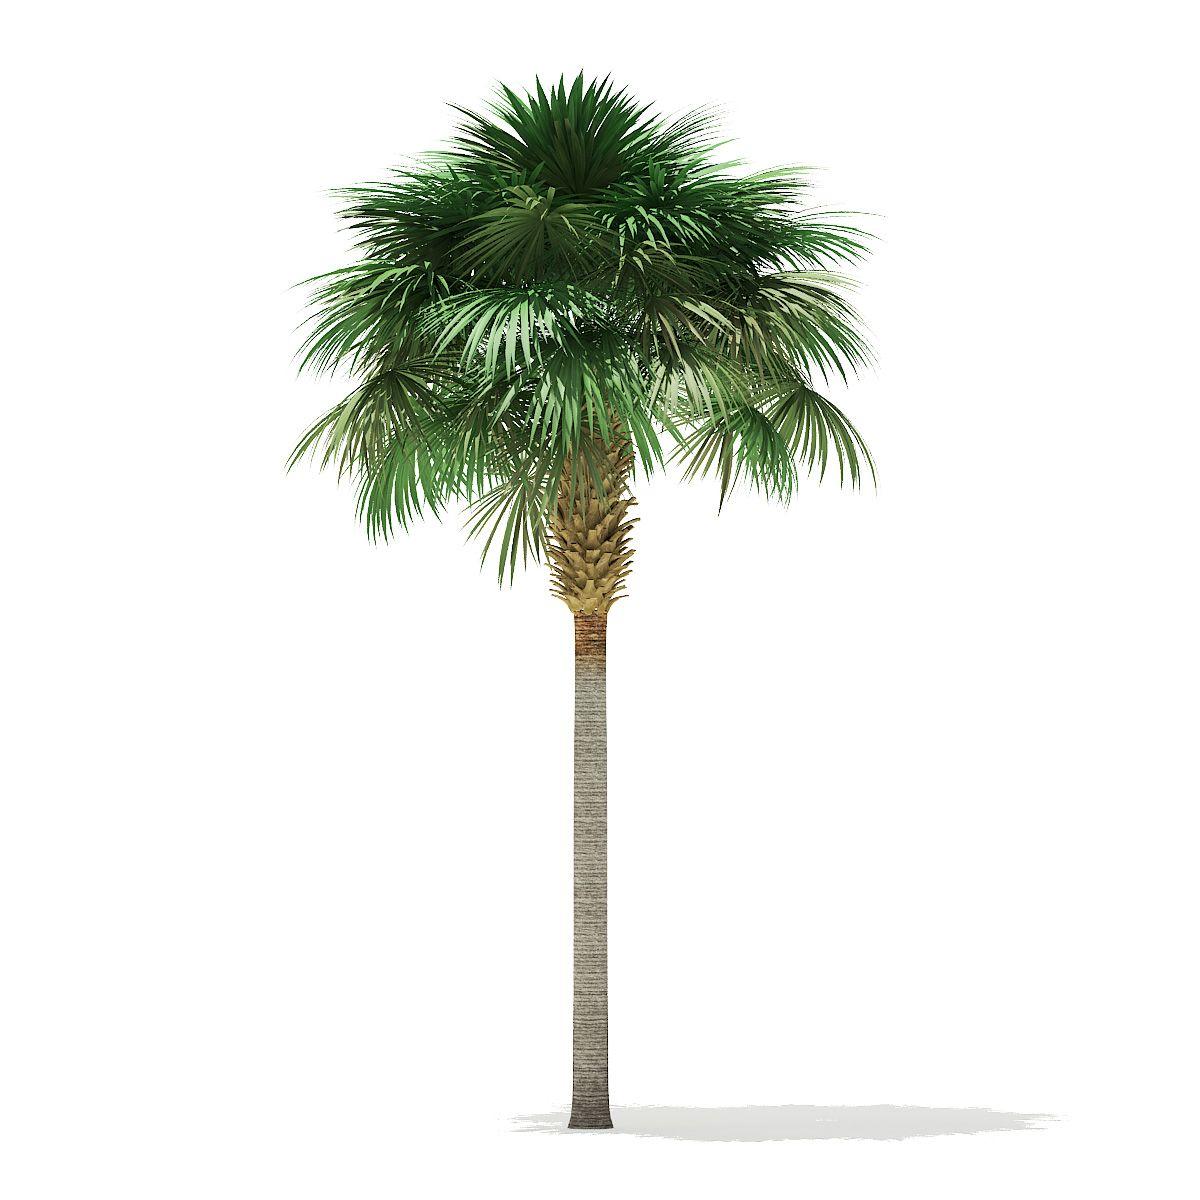 Sabal Palm Tree Palm Trees For Sale Palm Tree Vector Palm Trees